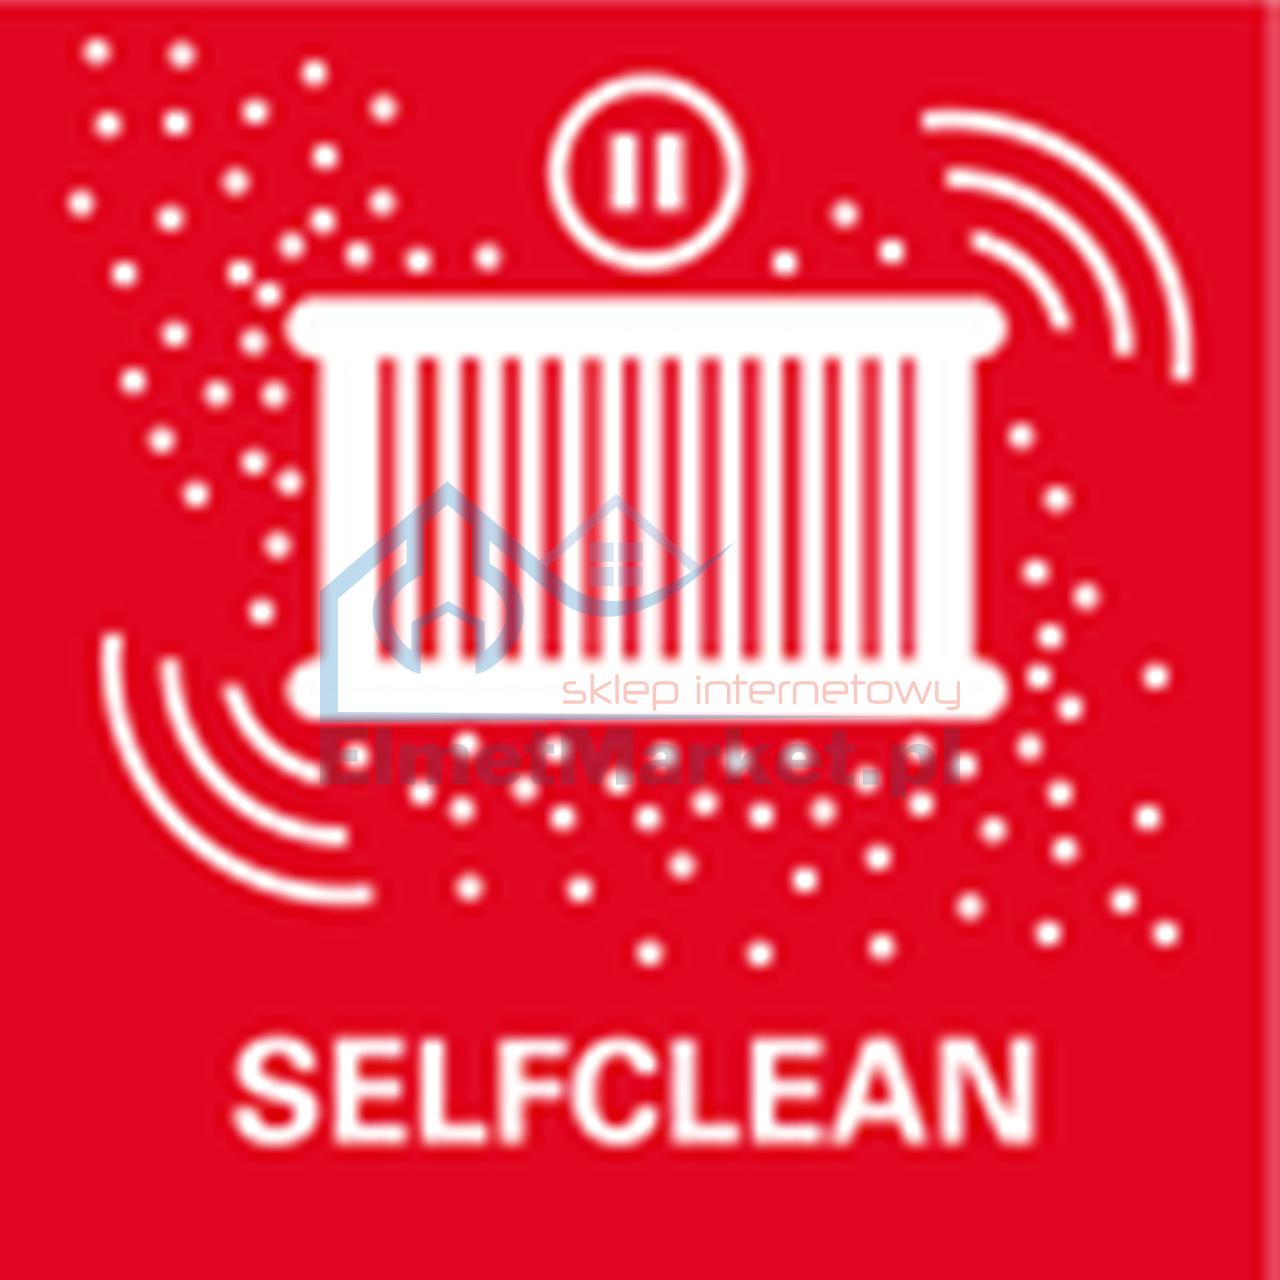 SelfClean: